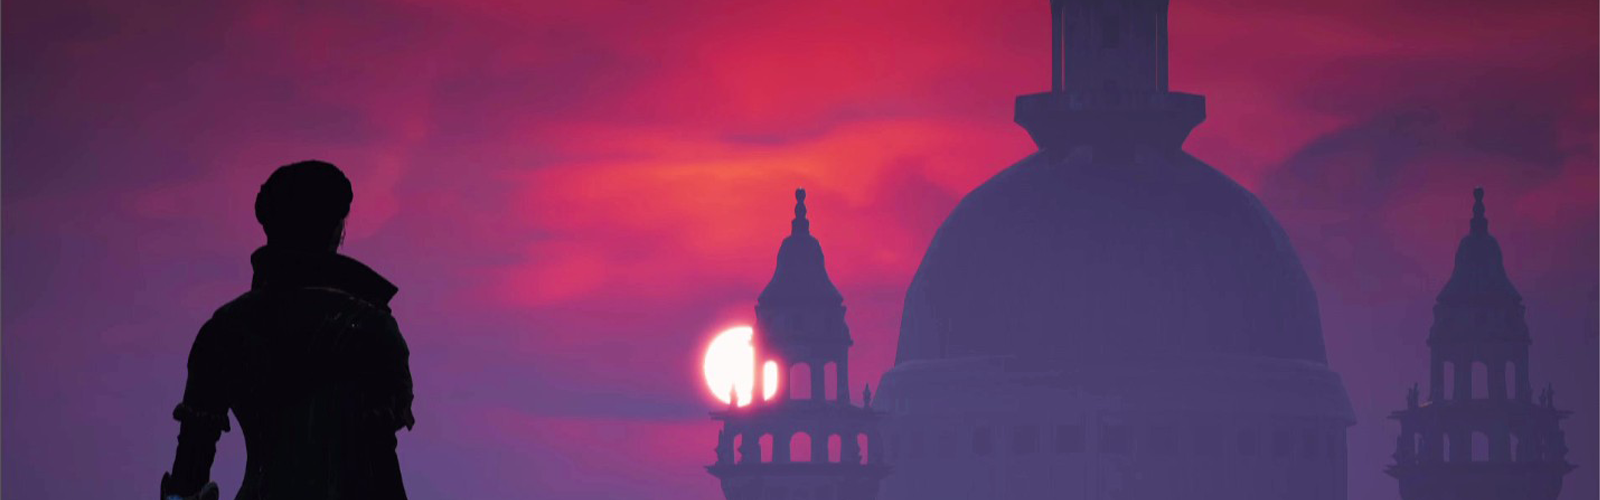 [2015-09-01] ACS_NEWS - EMEA - watchpage London Horizon Trailer - header